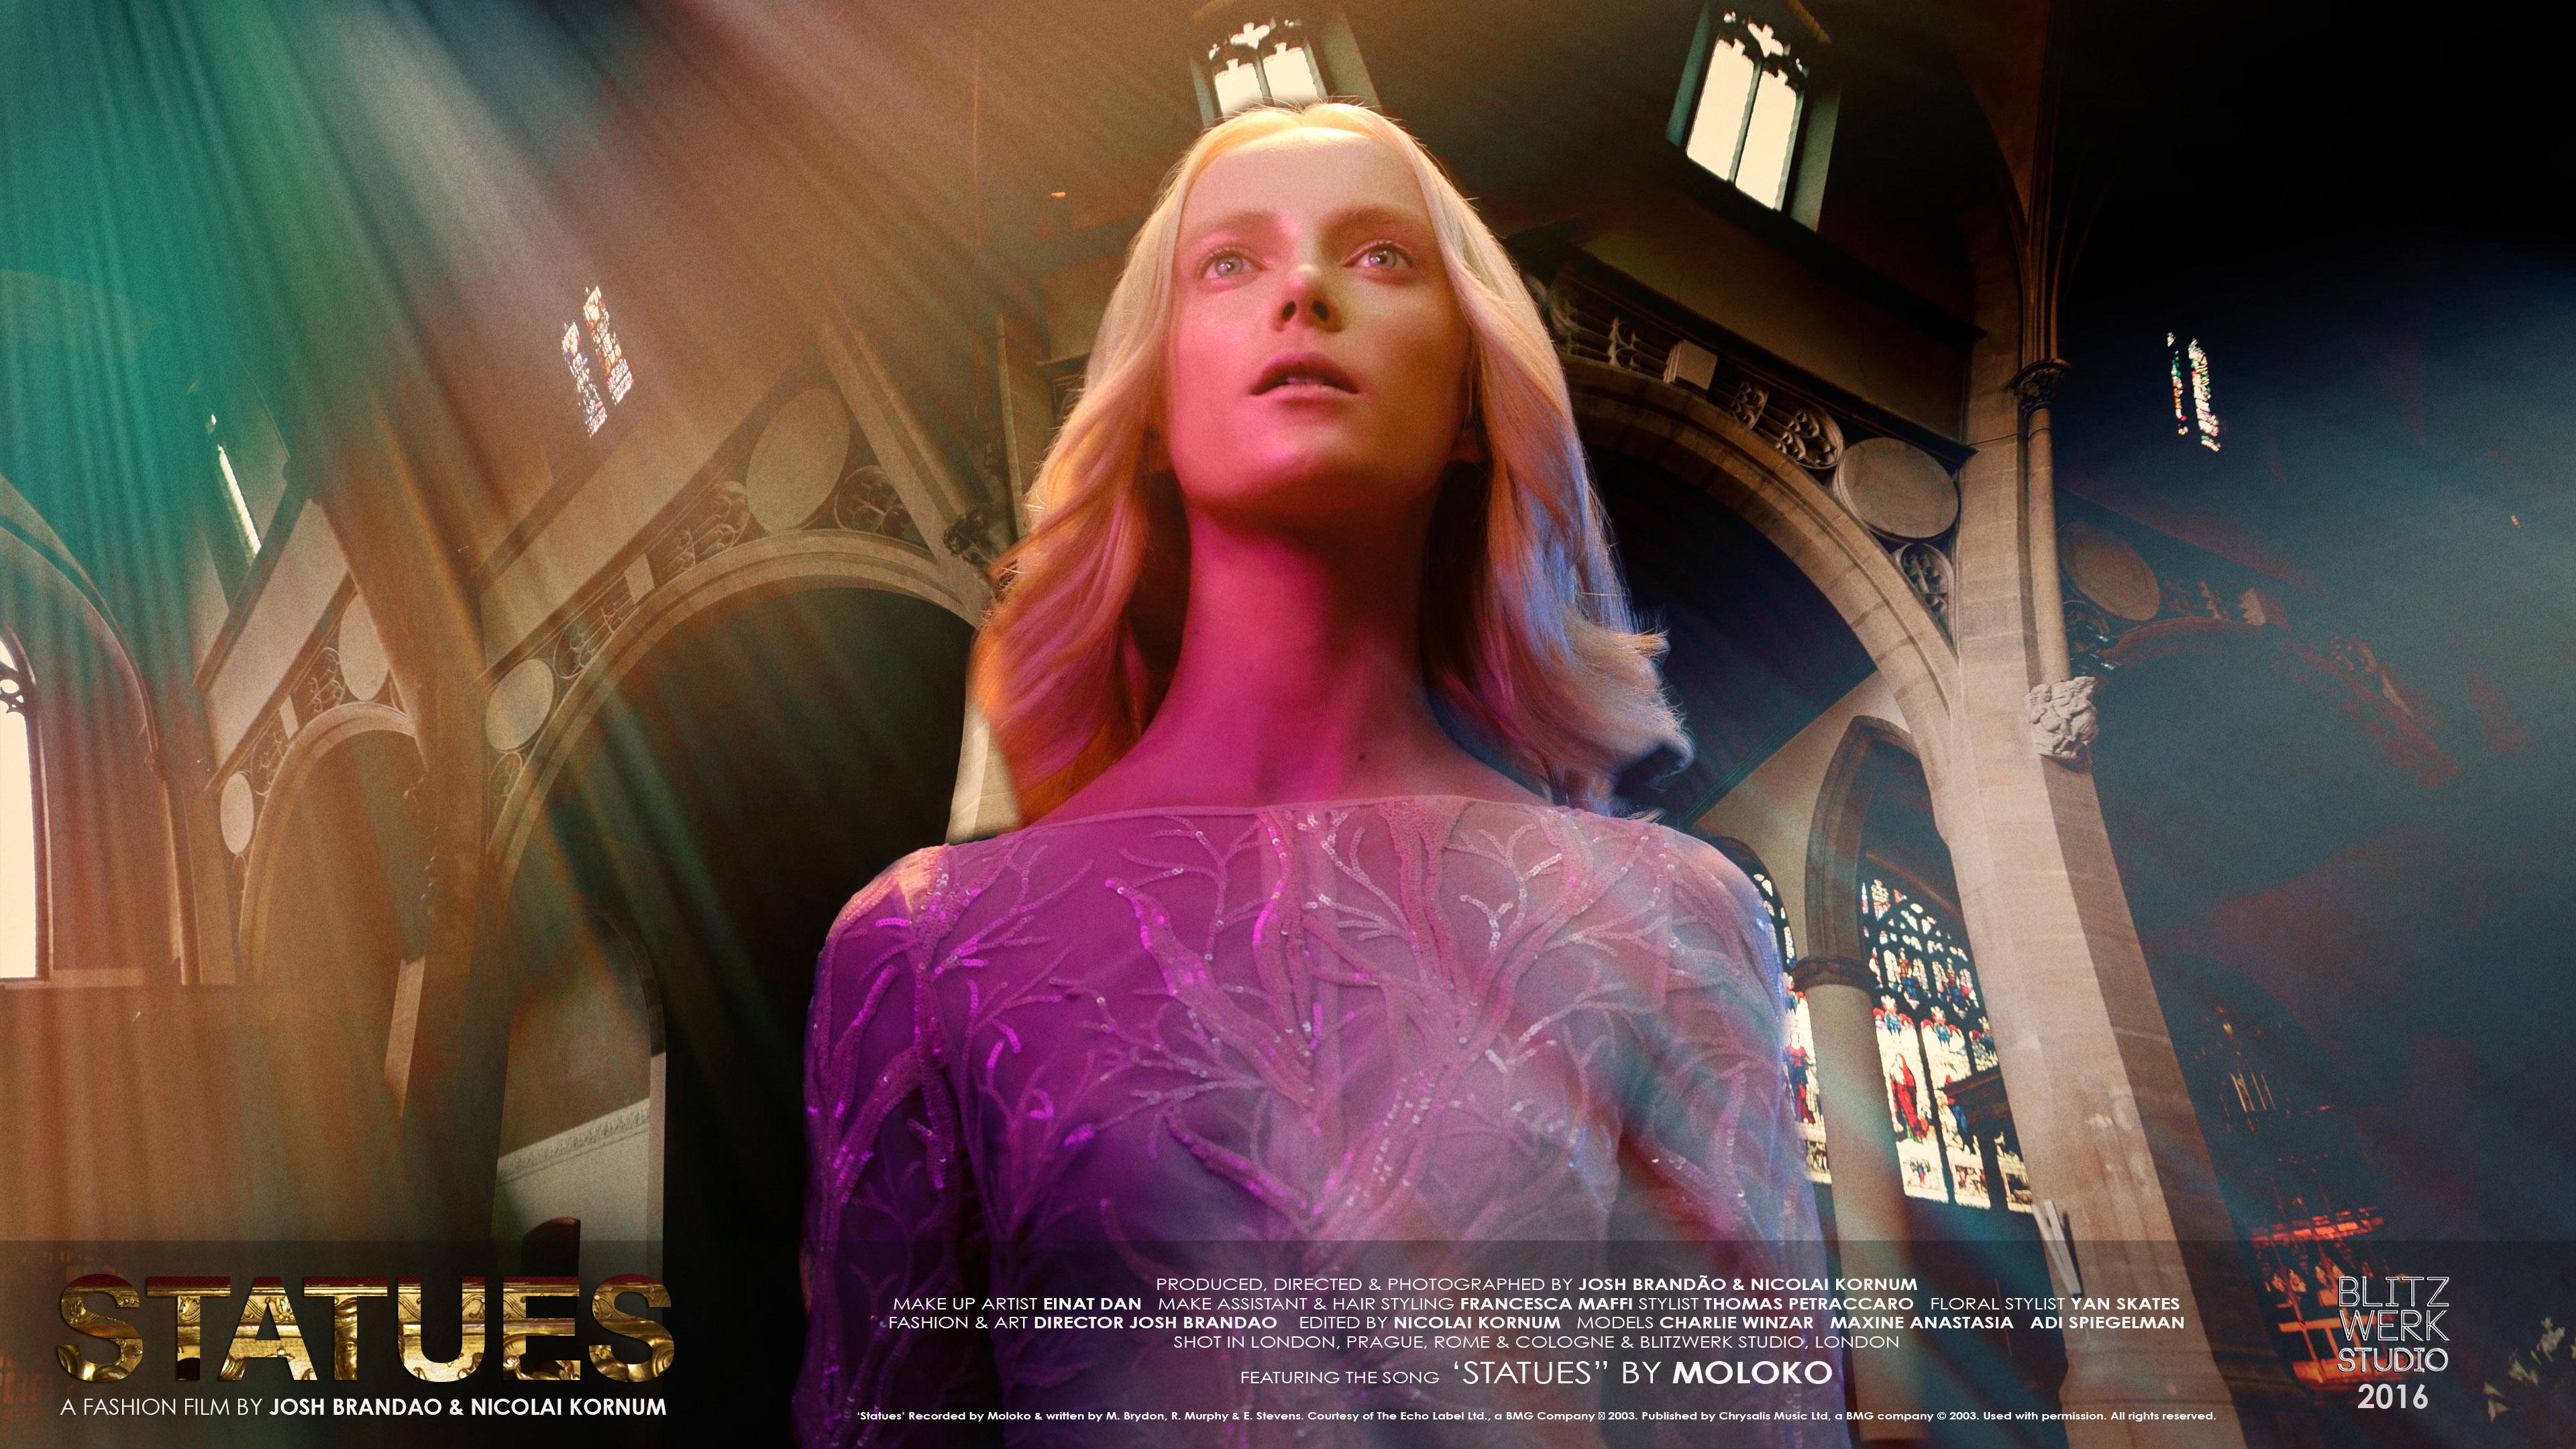 5 MAXINE ANASTASIA photo by BlitzWerk Studio with credits